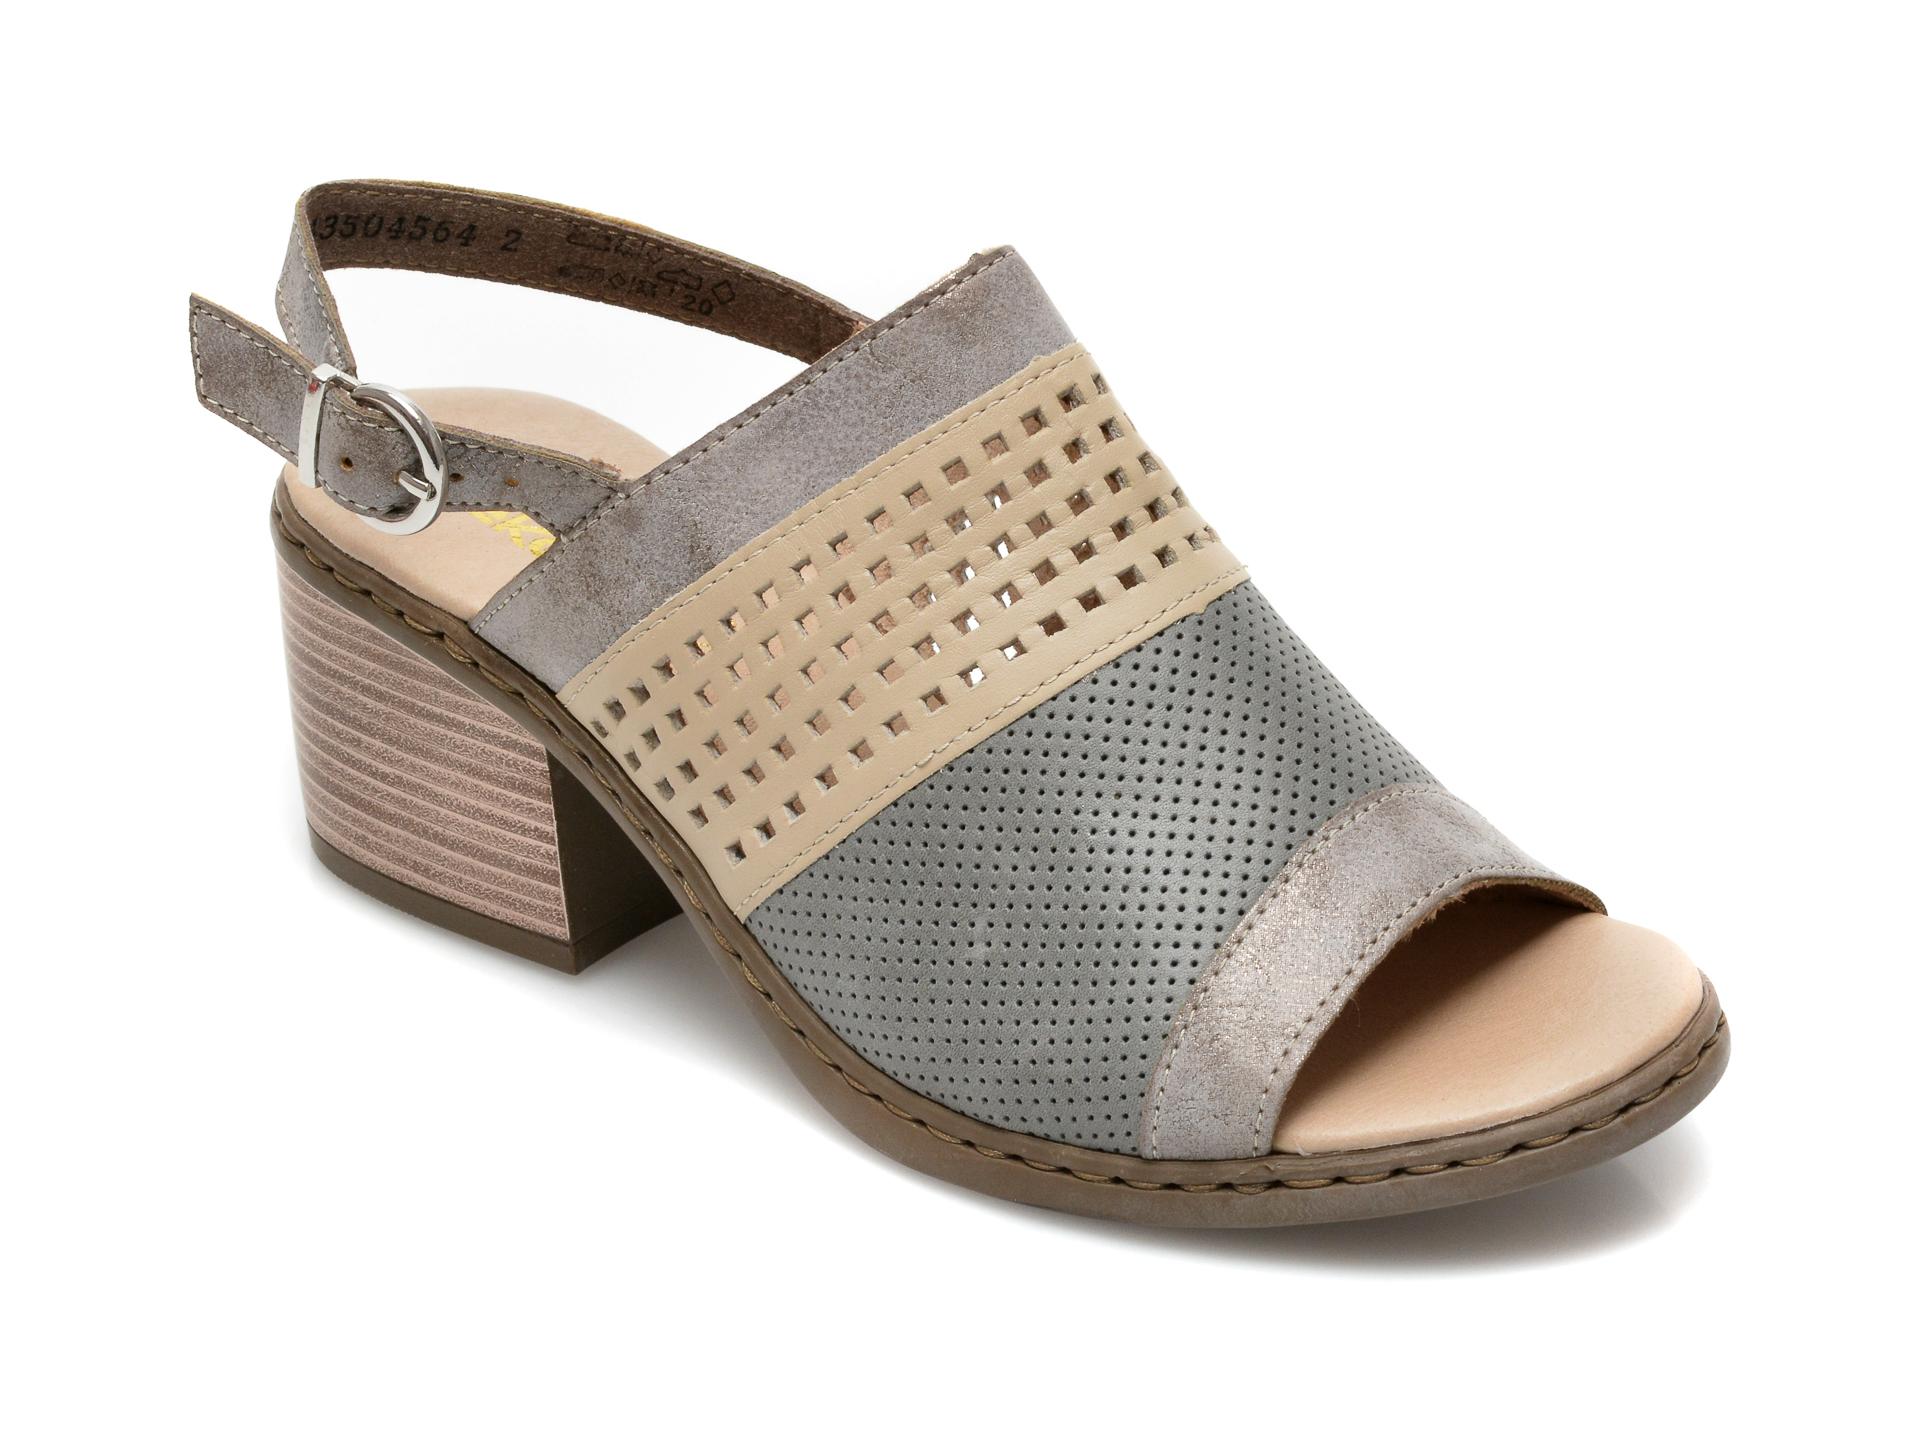 Sandale RIEKER gri, V0575, din piele ecologica